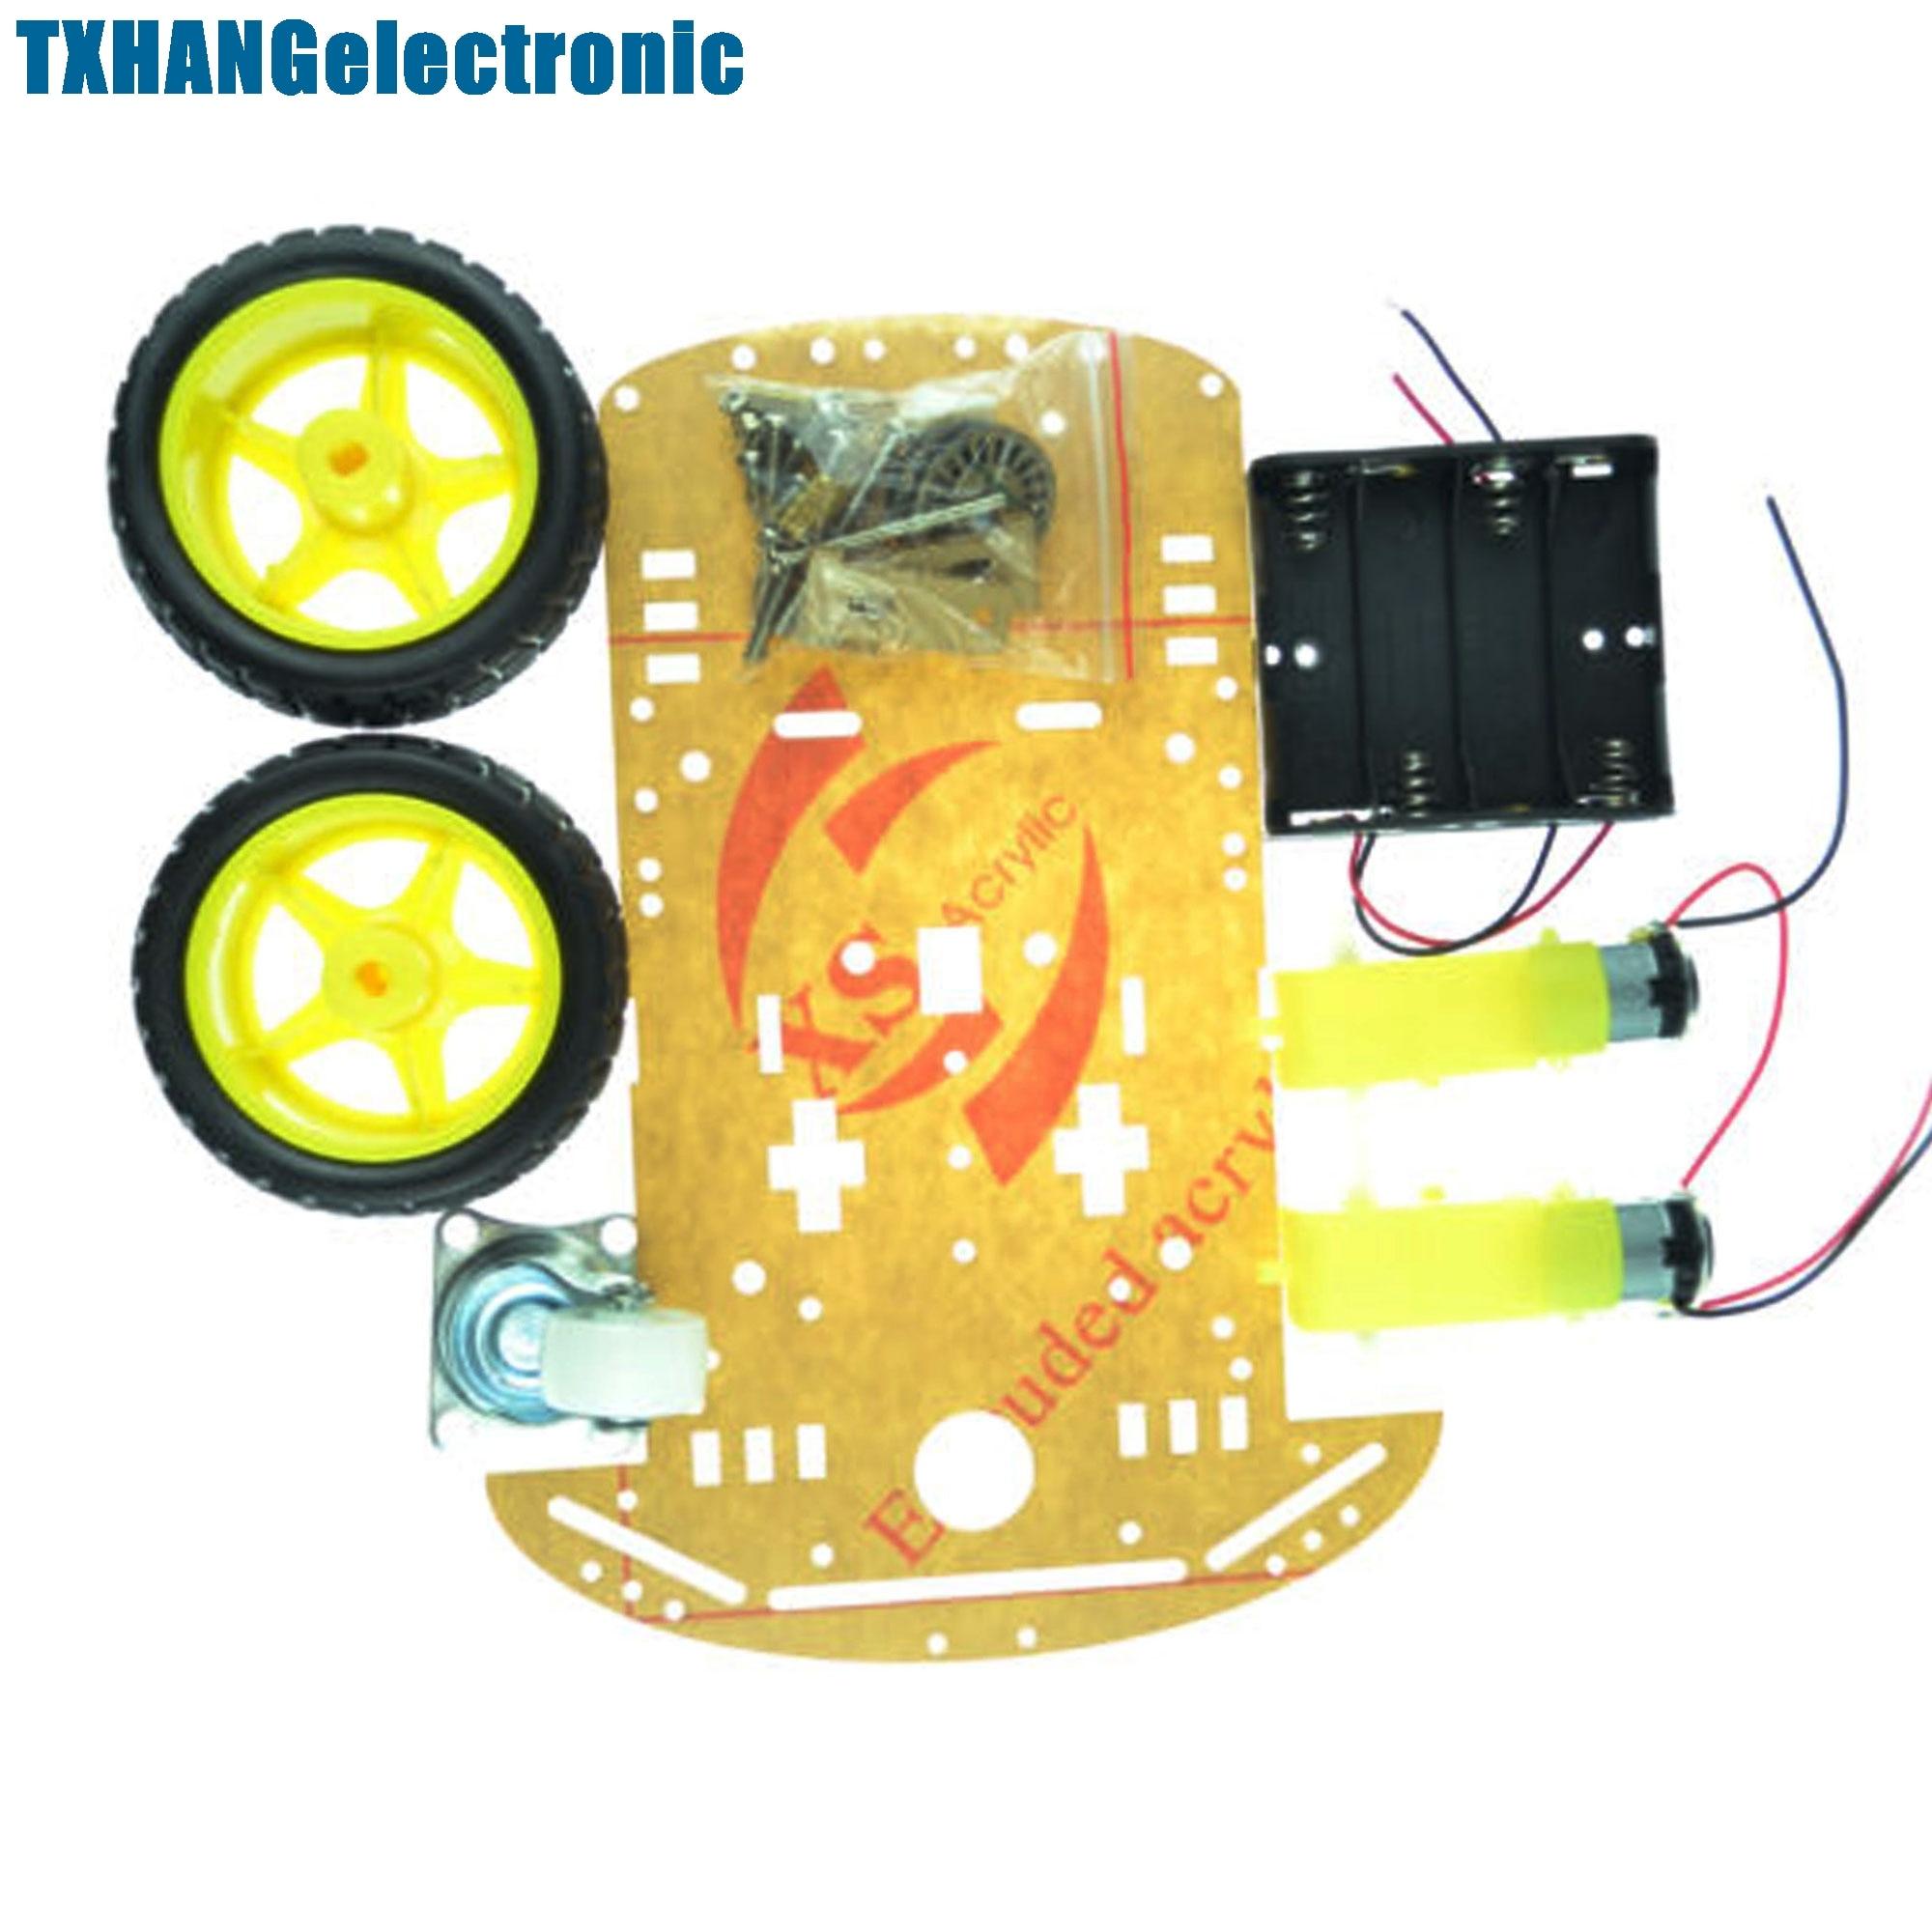 economy robot wooden tank chassis tt motor 3 9v tracked intelligent car tool r9ue 2WD Smart Robot Car Chassis Kit/Speed encoder Battery Box 2 motor 1:48 DIY electronics